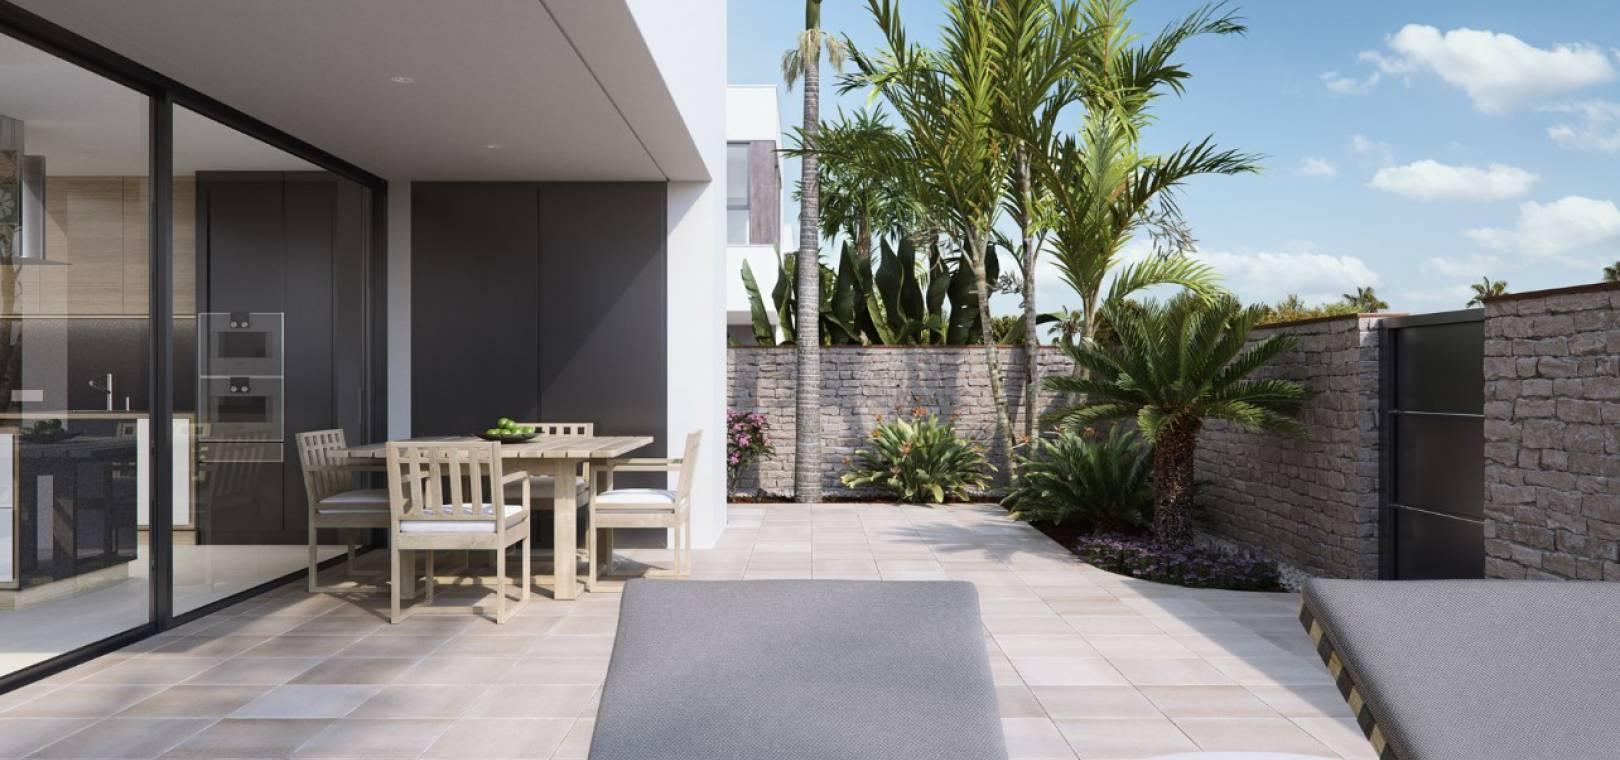 Torre_de_la_Horadada_New_Build_Luxury_Houses_For_Sale_nsp256_8